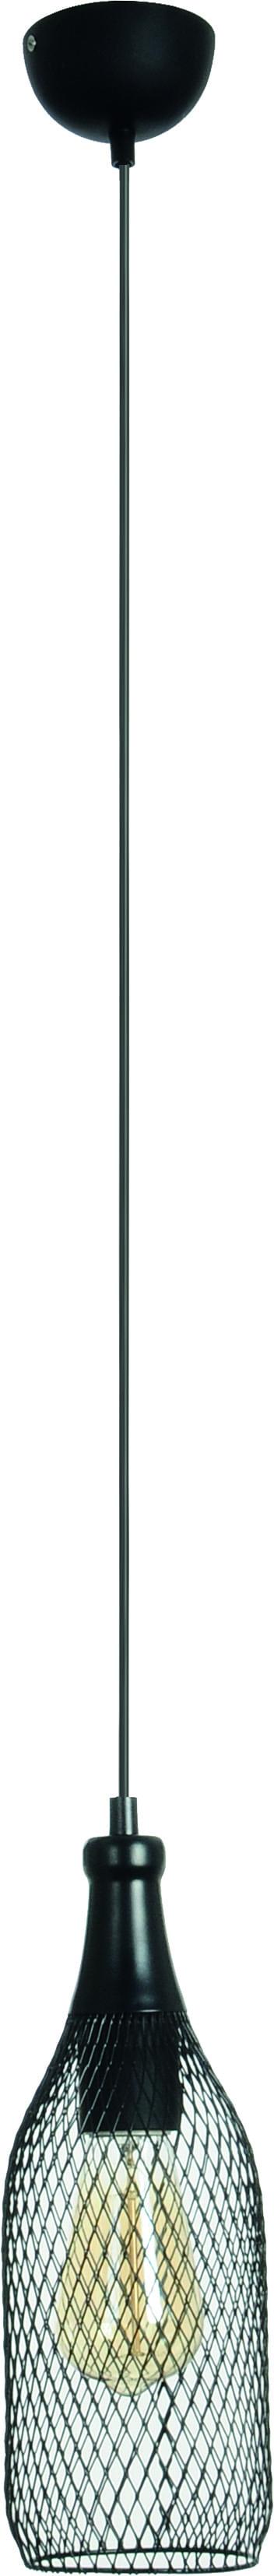 Hanging lamp Barla black net 60W transparent